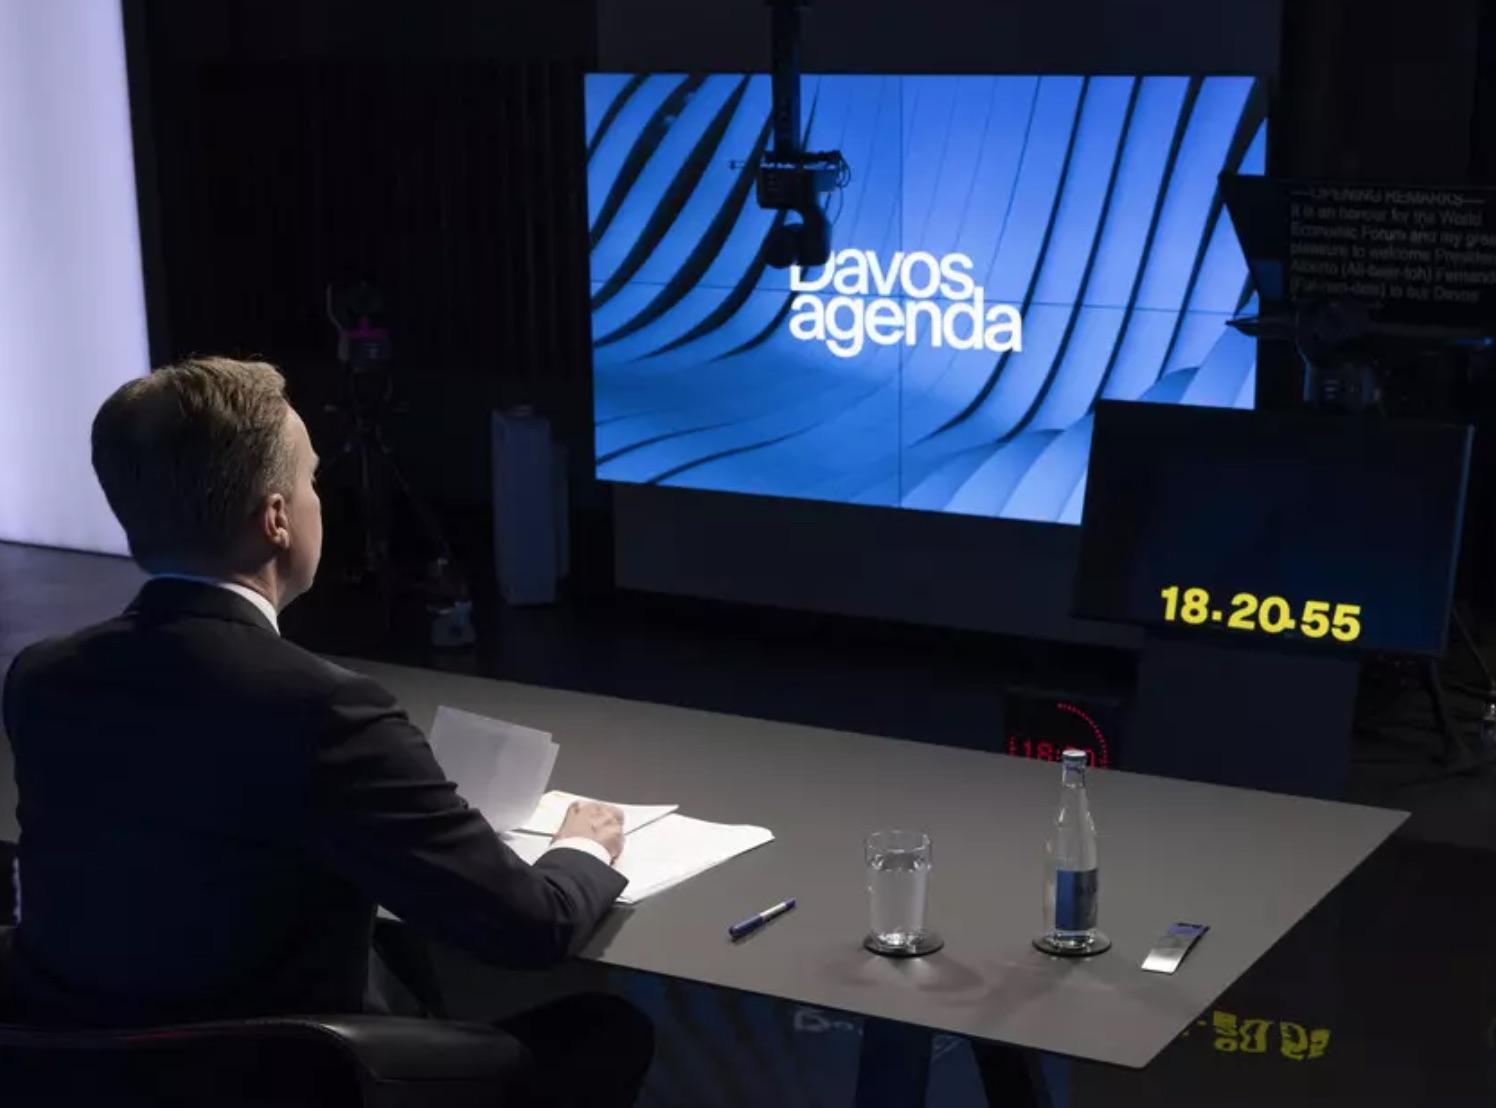 Davos Agenda